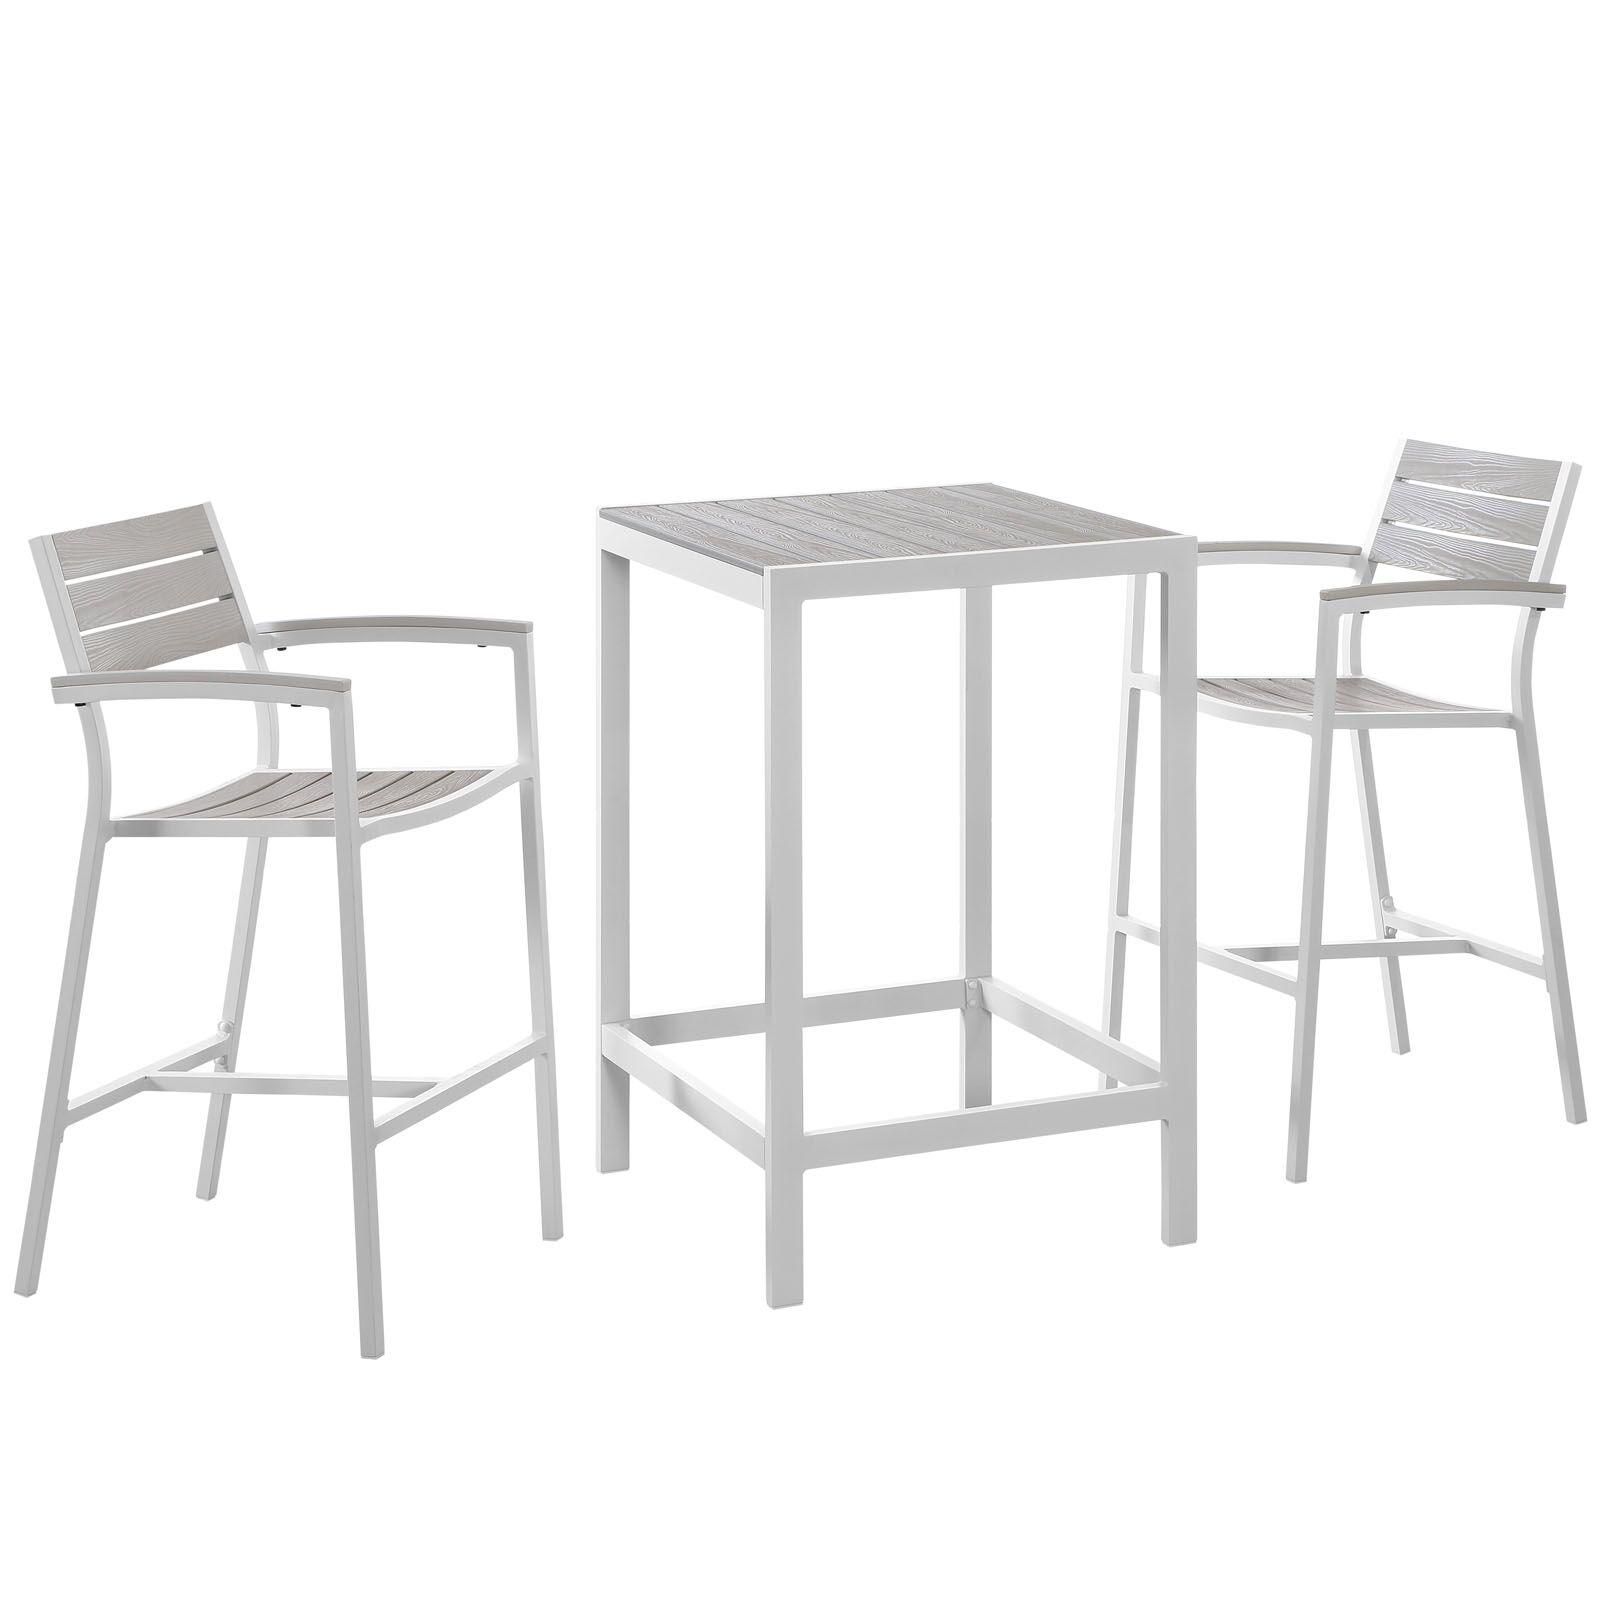 Ellport 3 Piece Bar Height Dining Set Finish: White / Light Grey